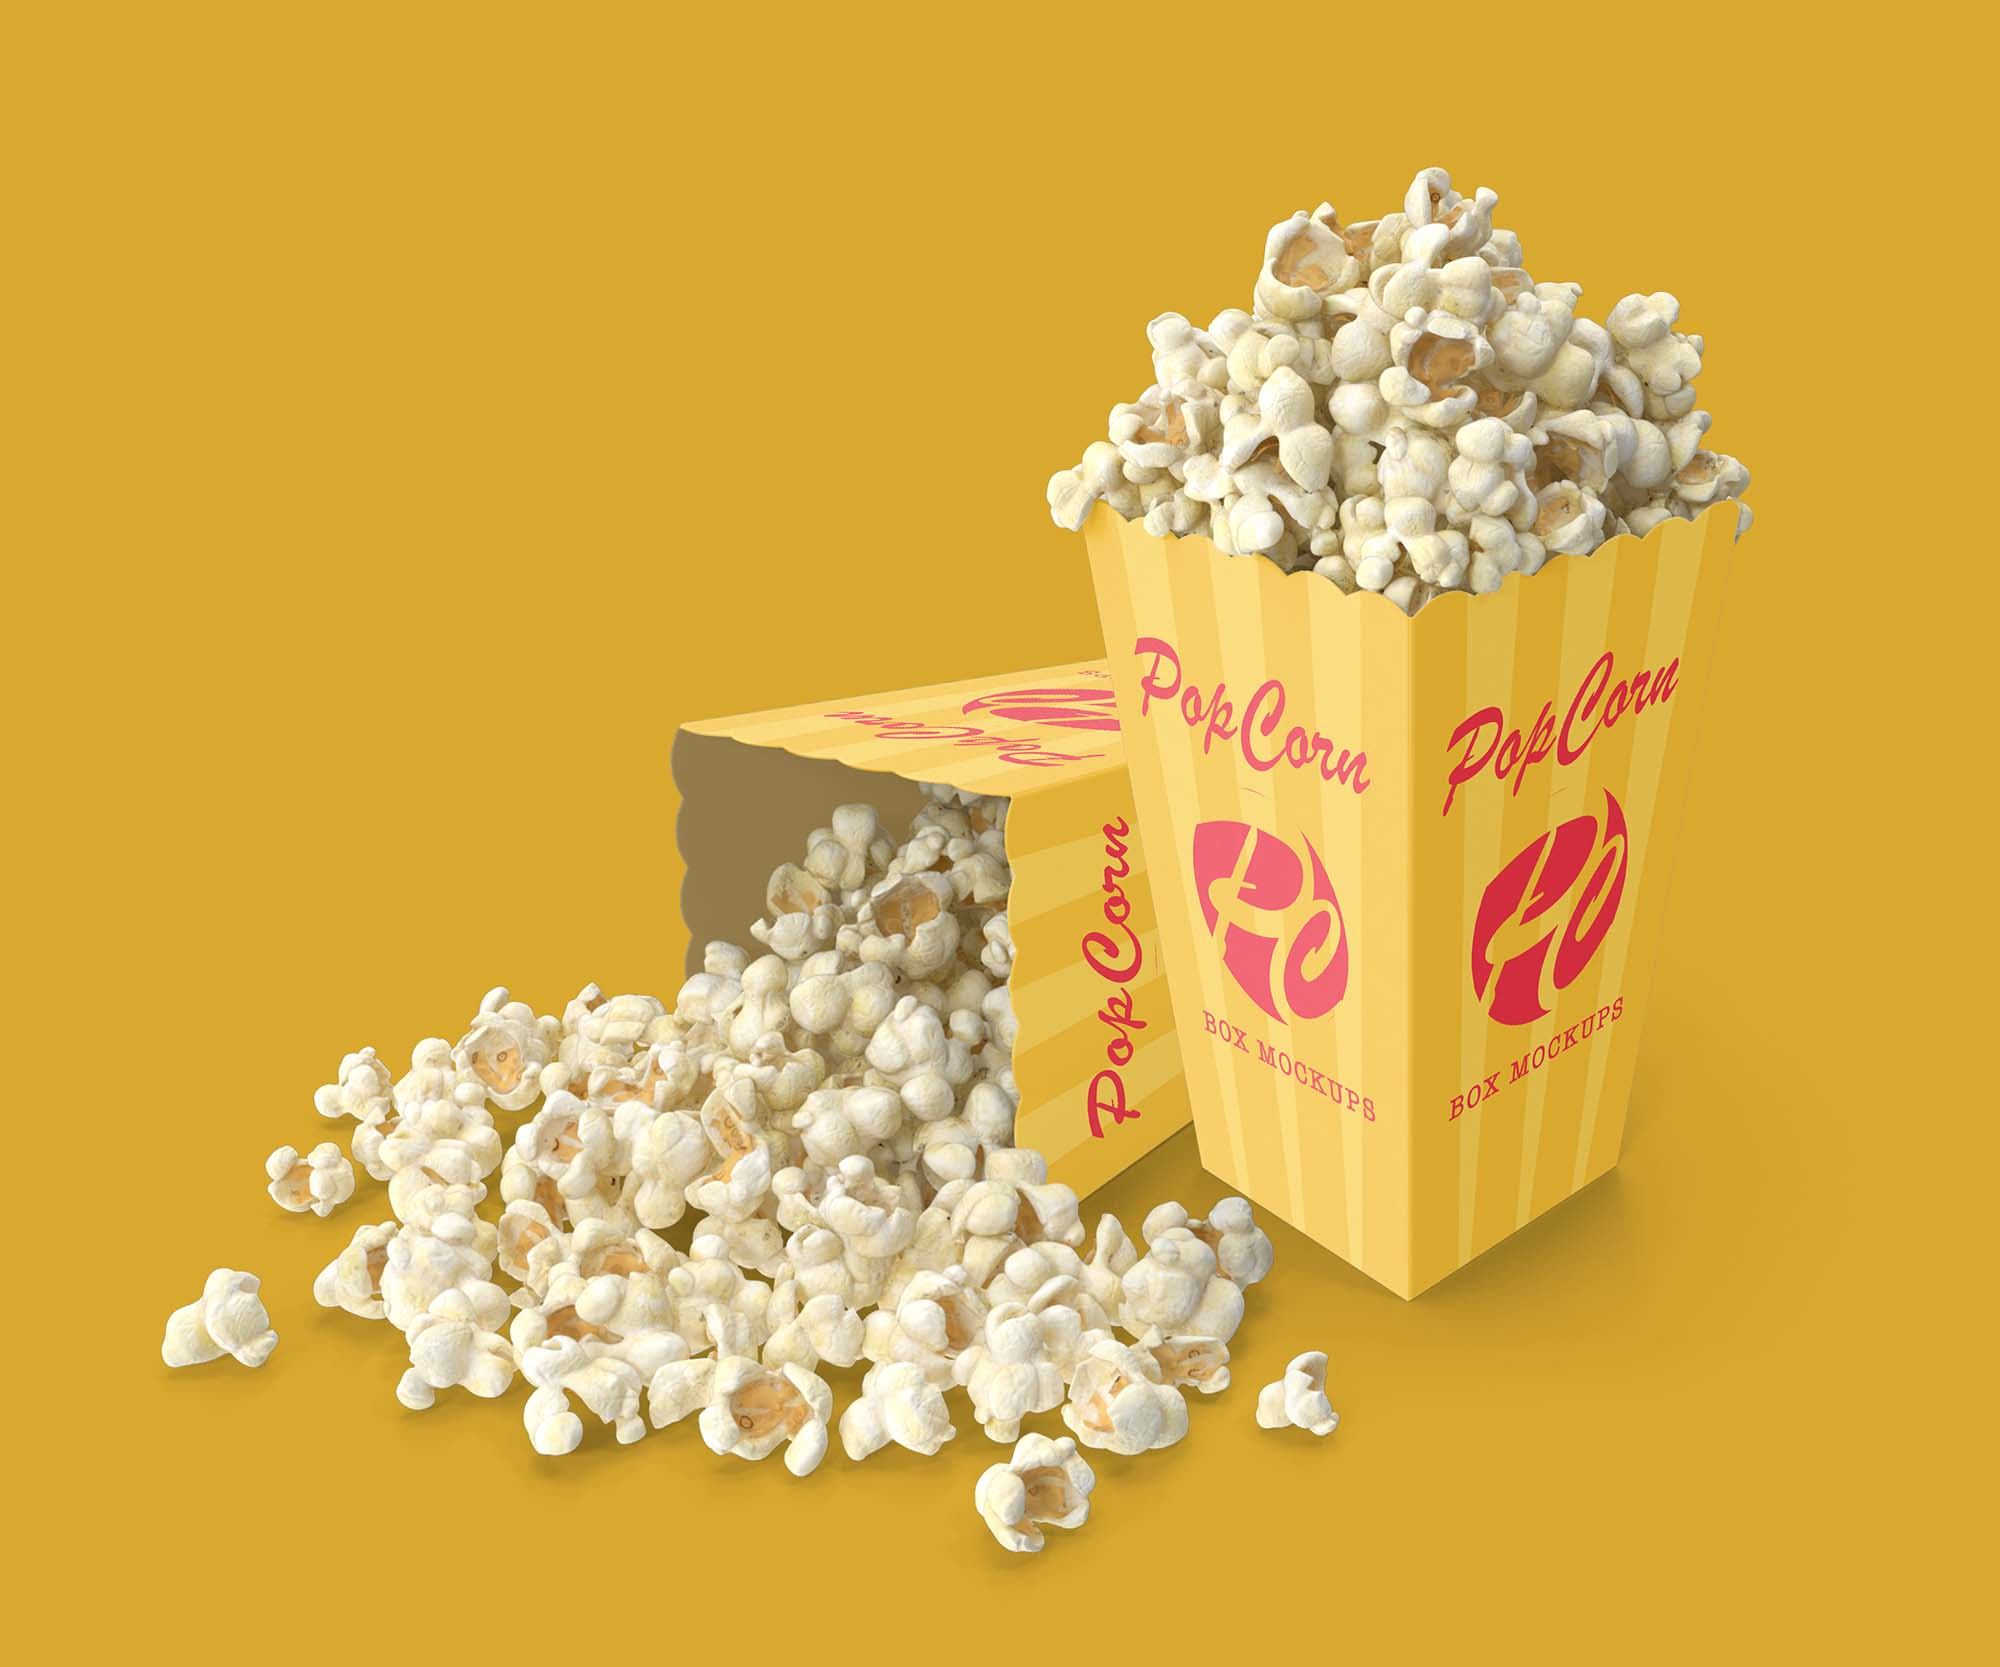 Popcorn Box Mockup 2